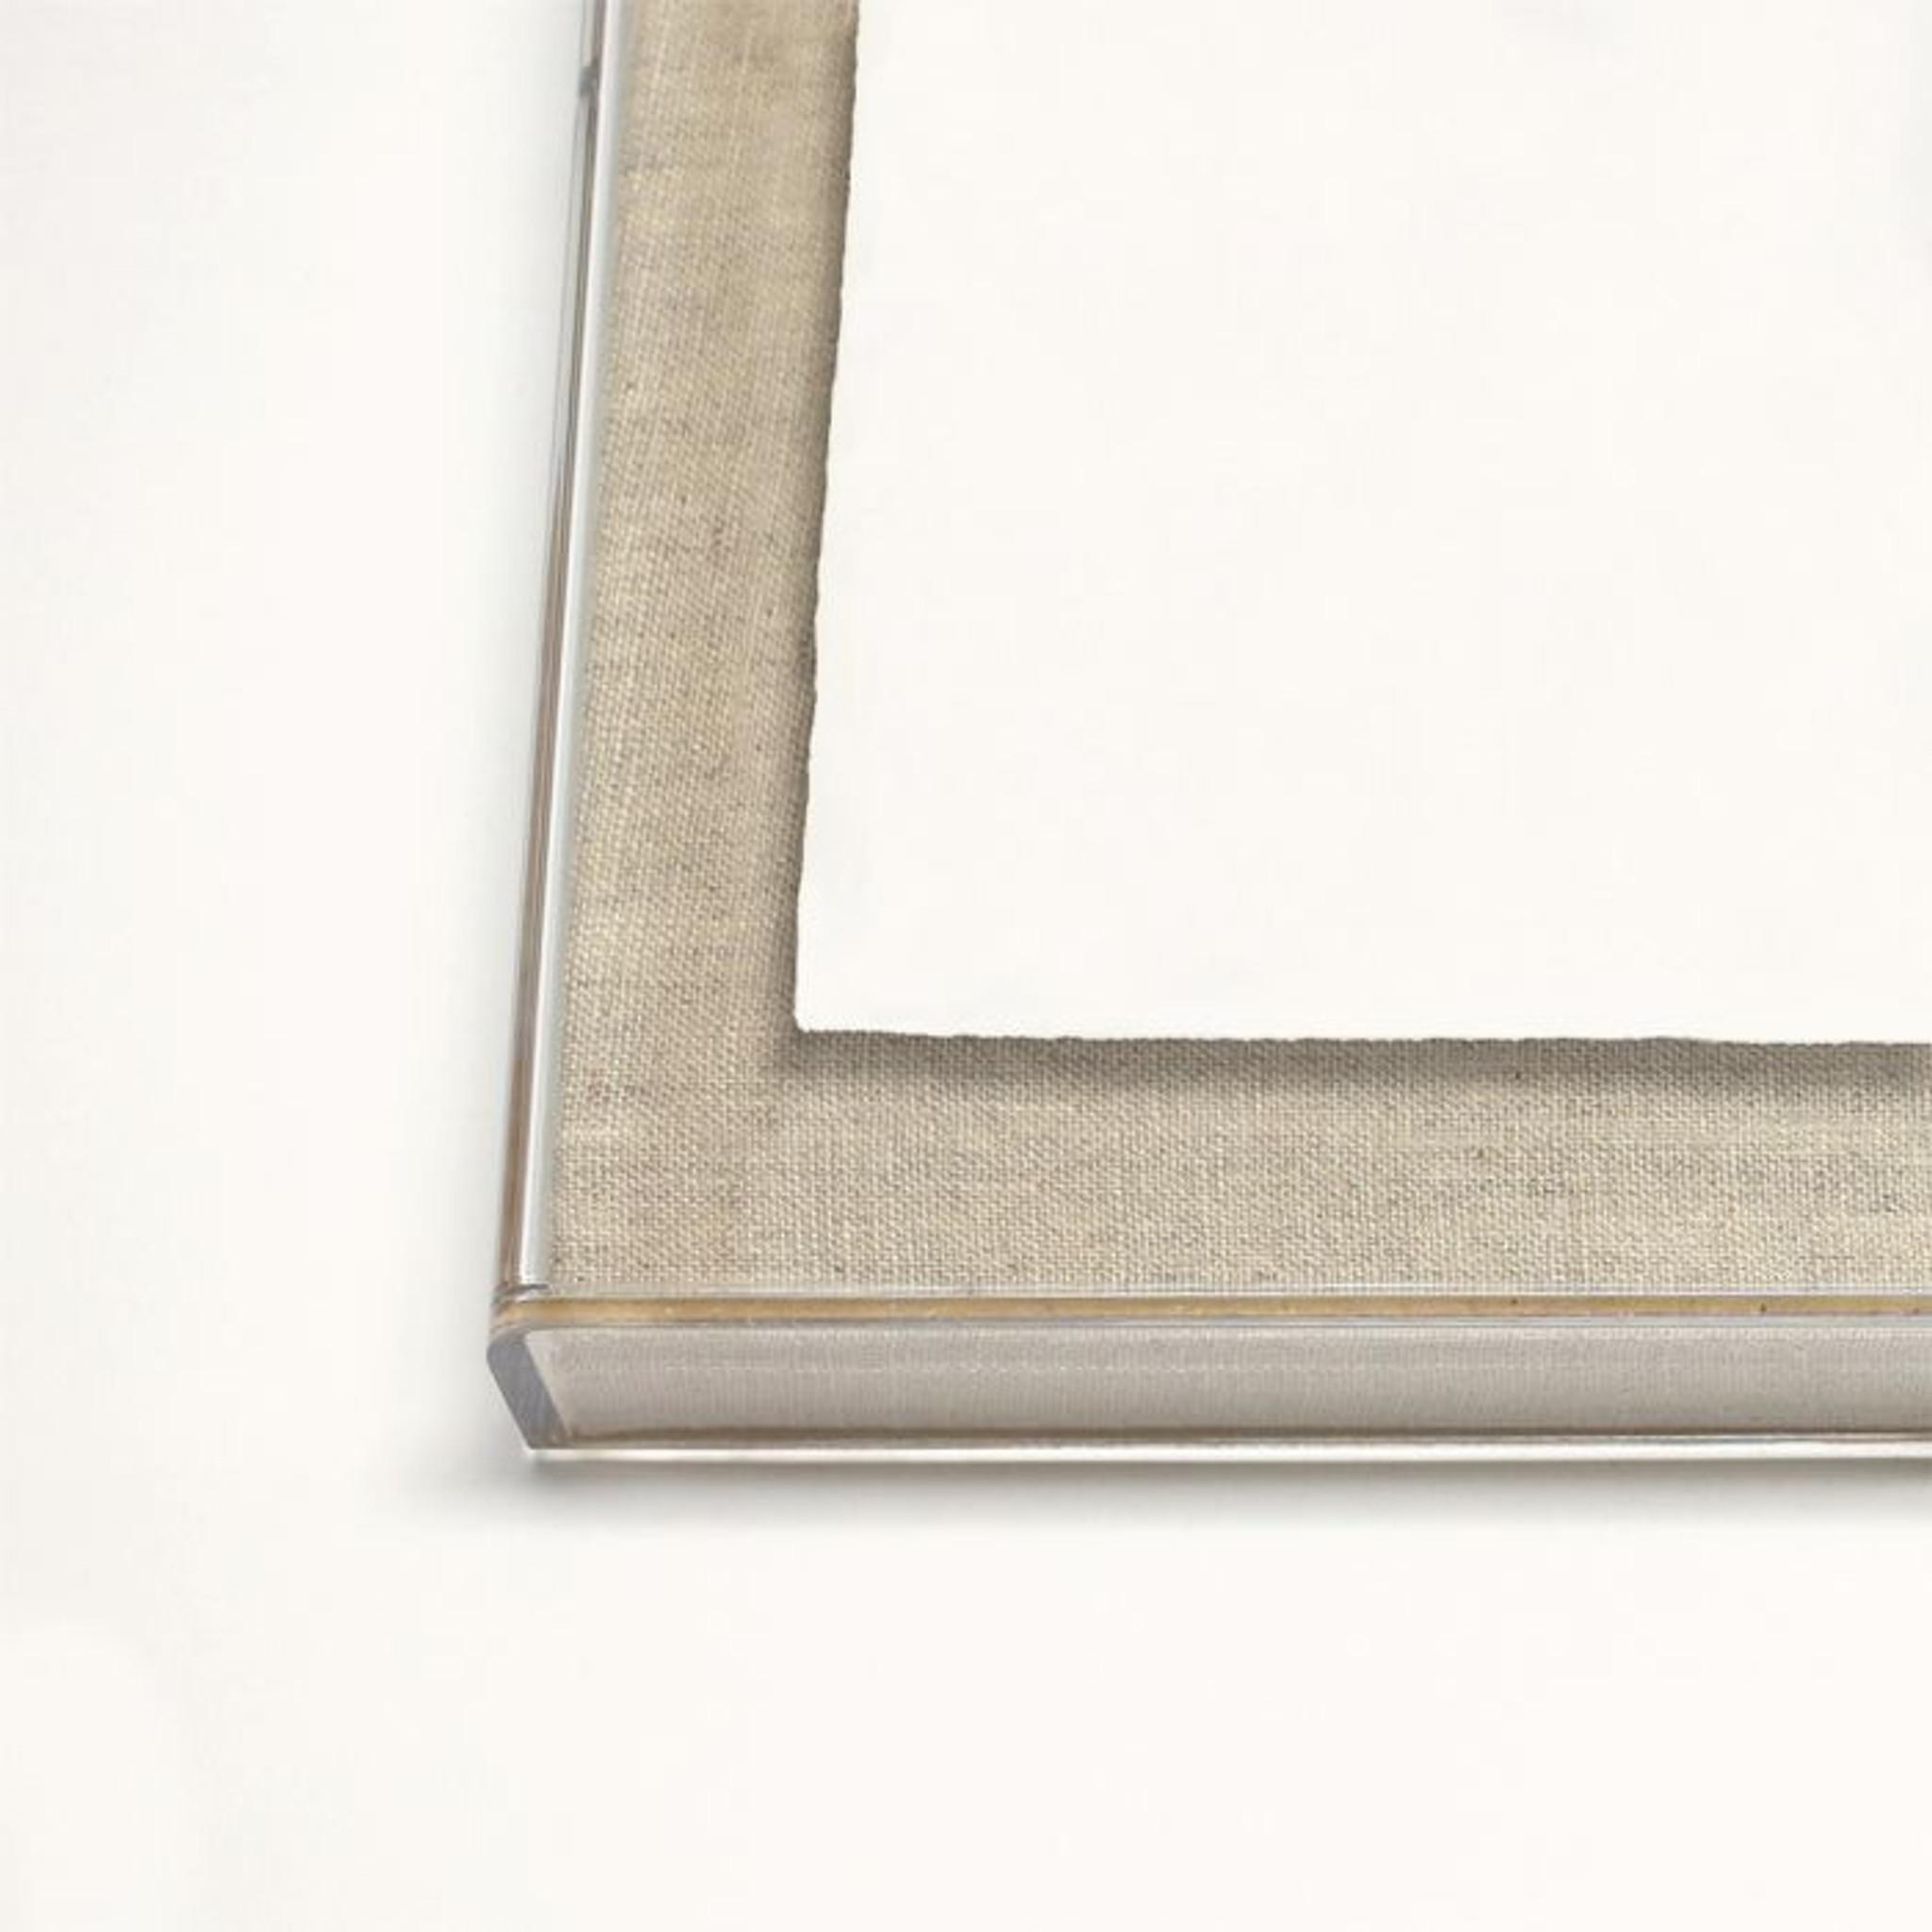 Natural Curiosities Folden Float ocean no 7 Fine Photography Wall Art with Acrylic Frame